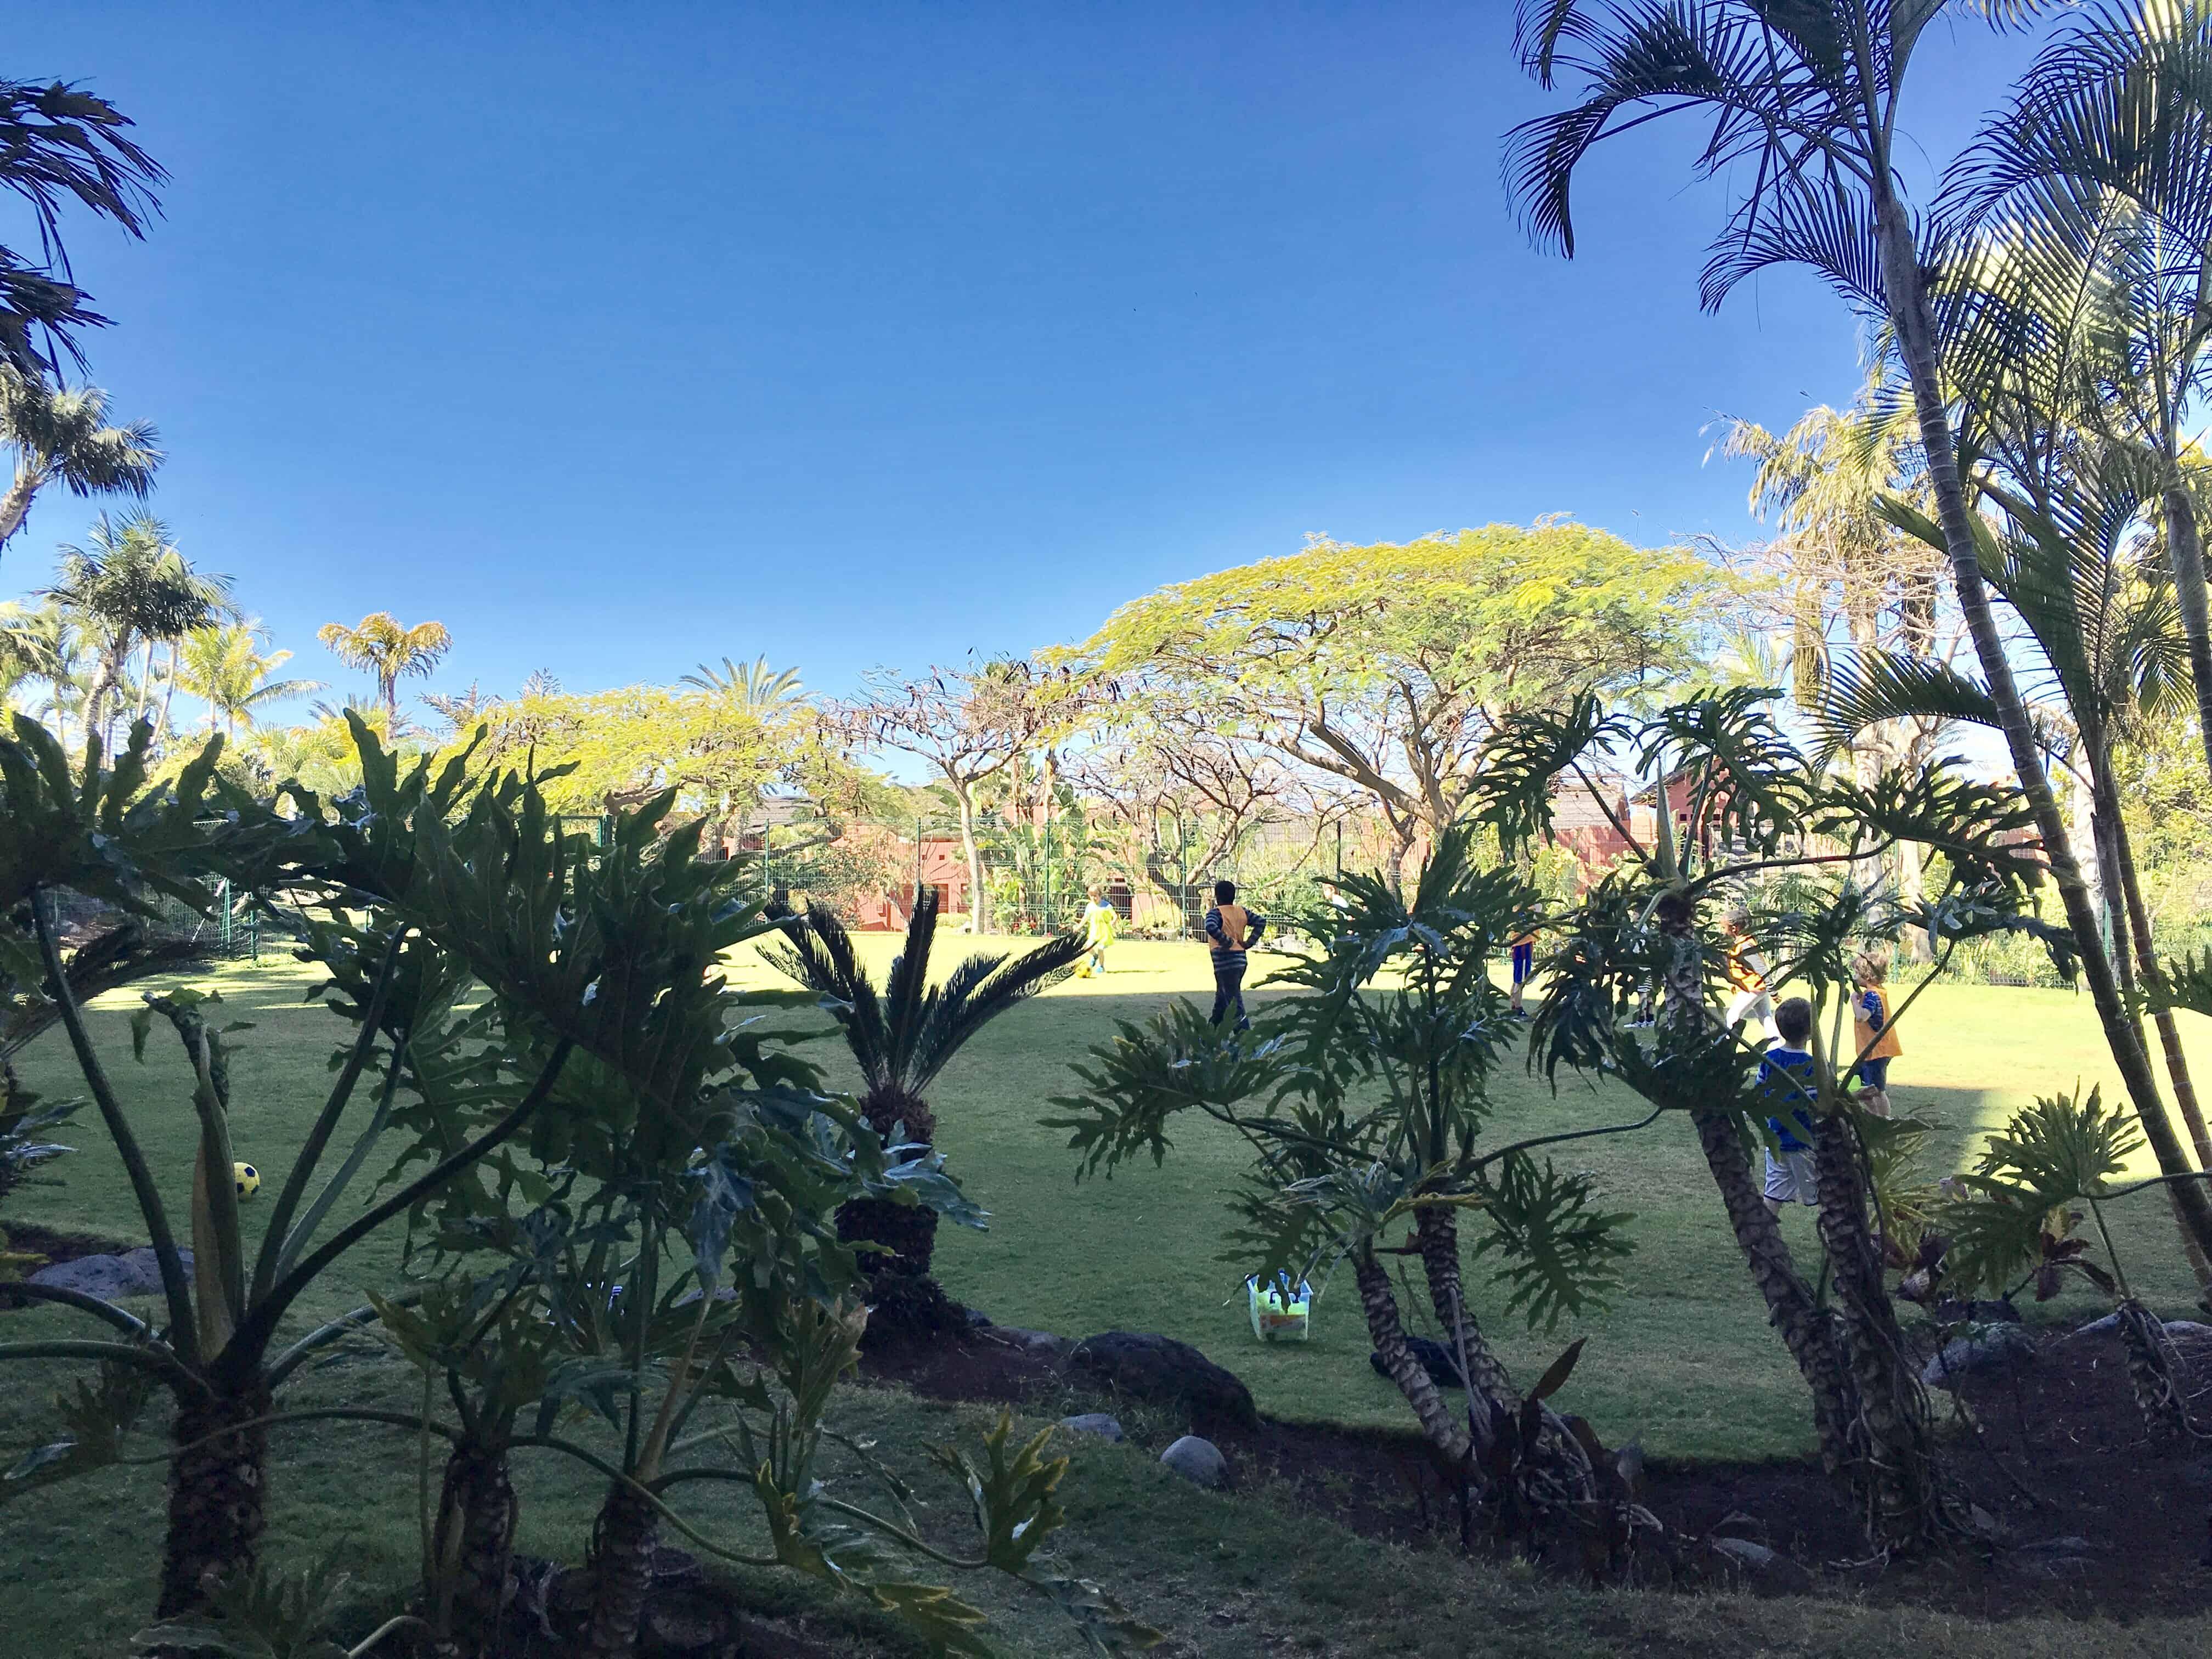 Lawn Games - Ritz Kids Club, Abama, Canary Islands